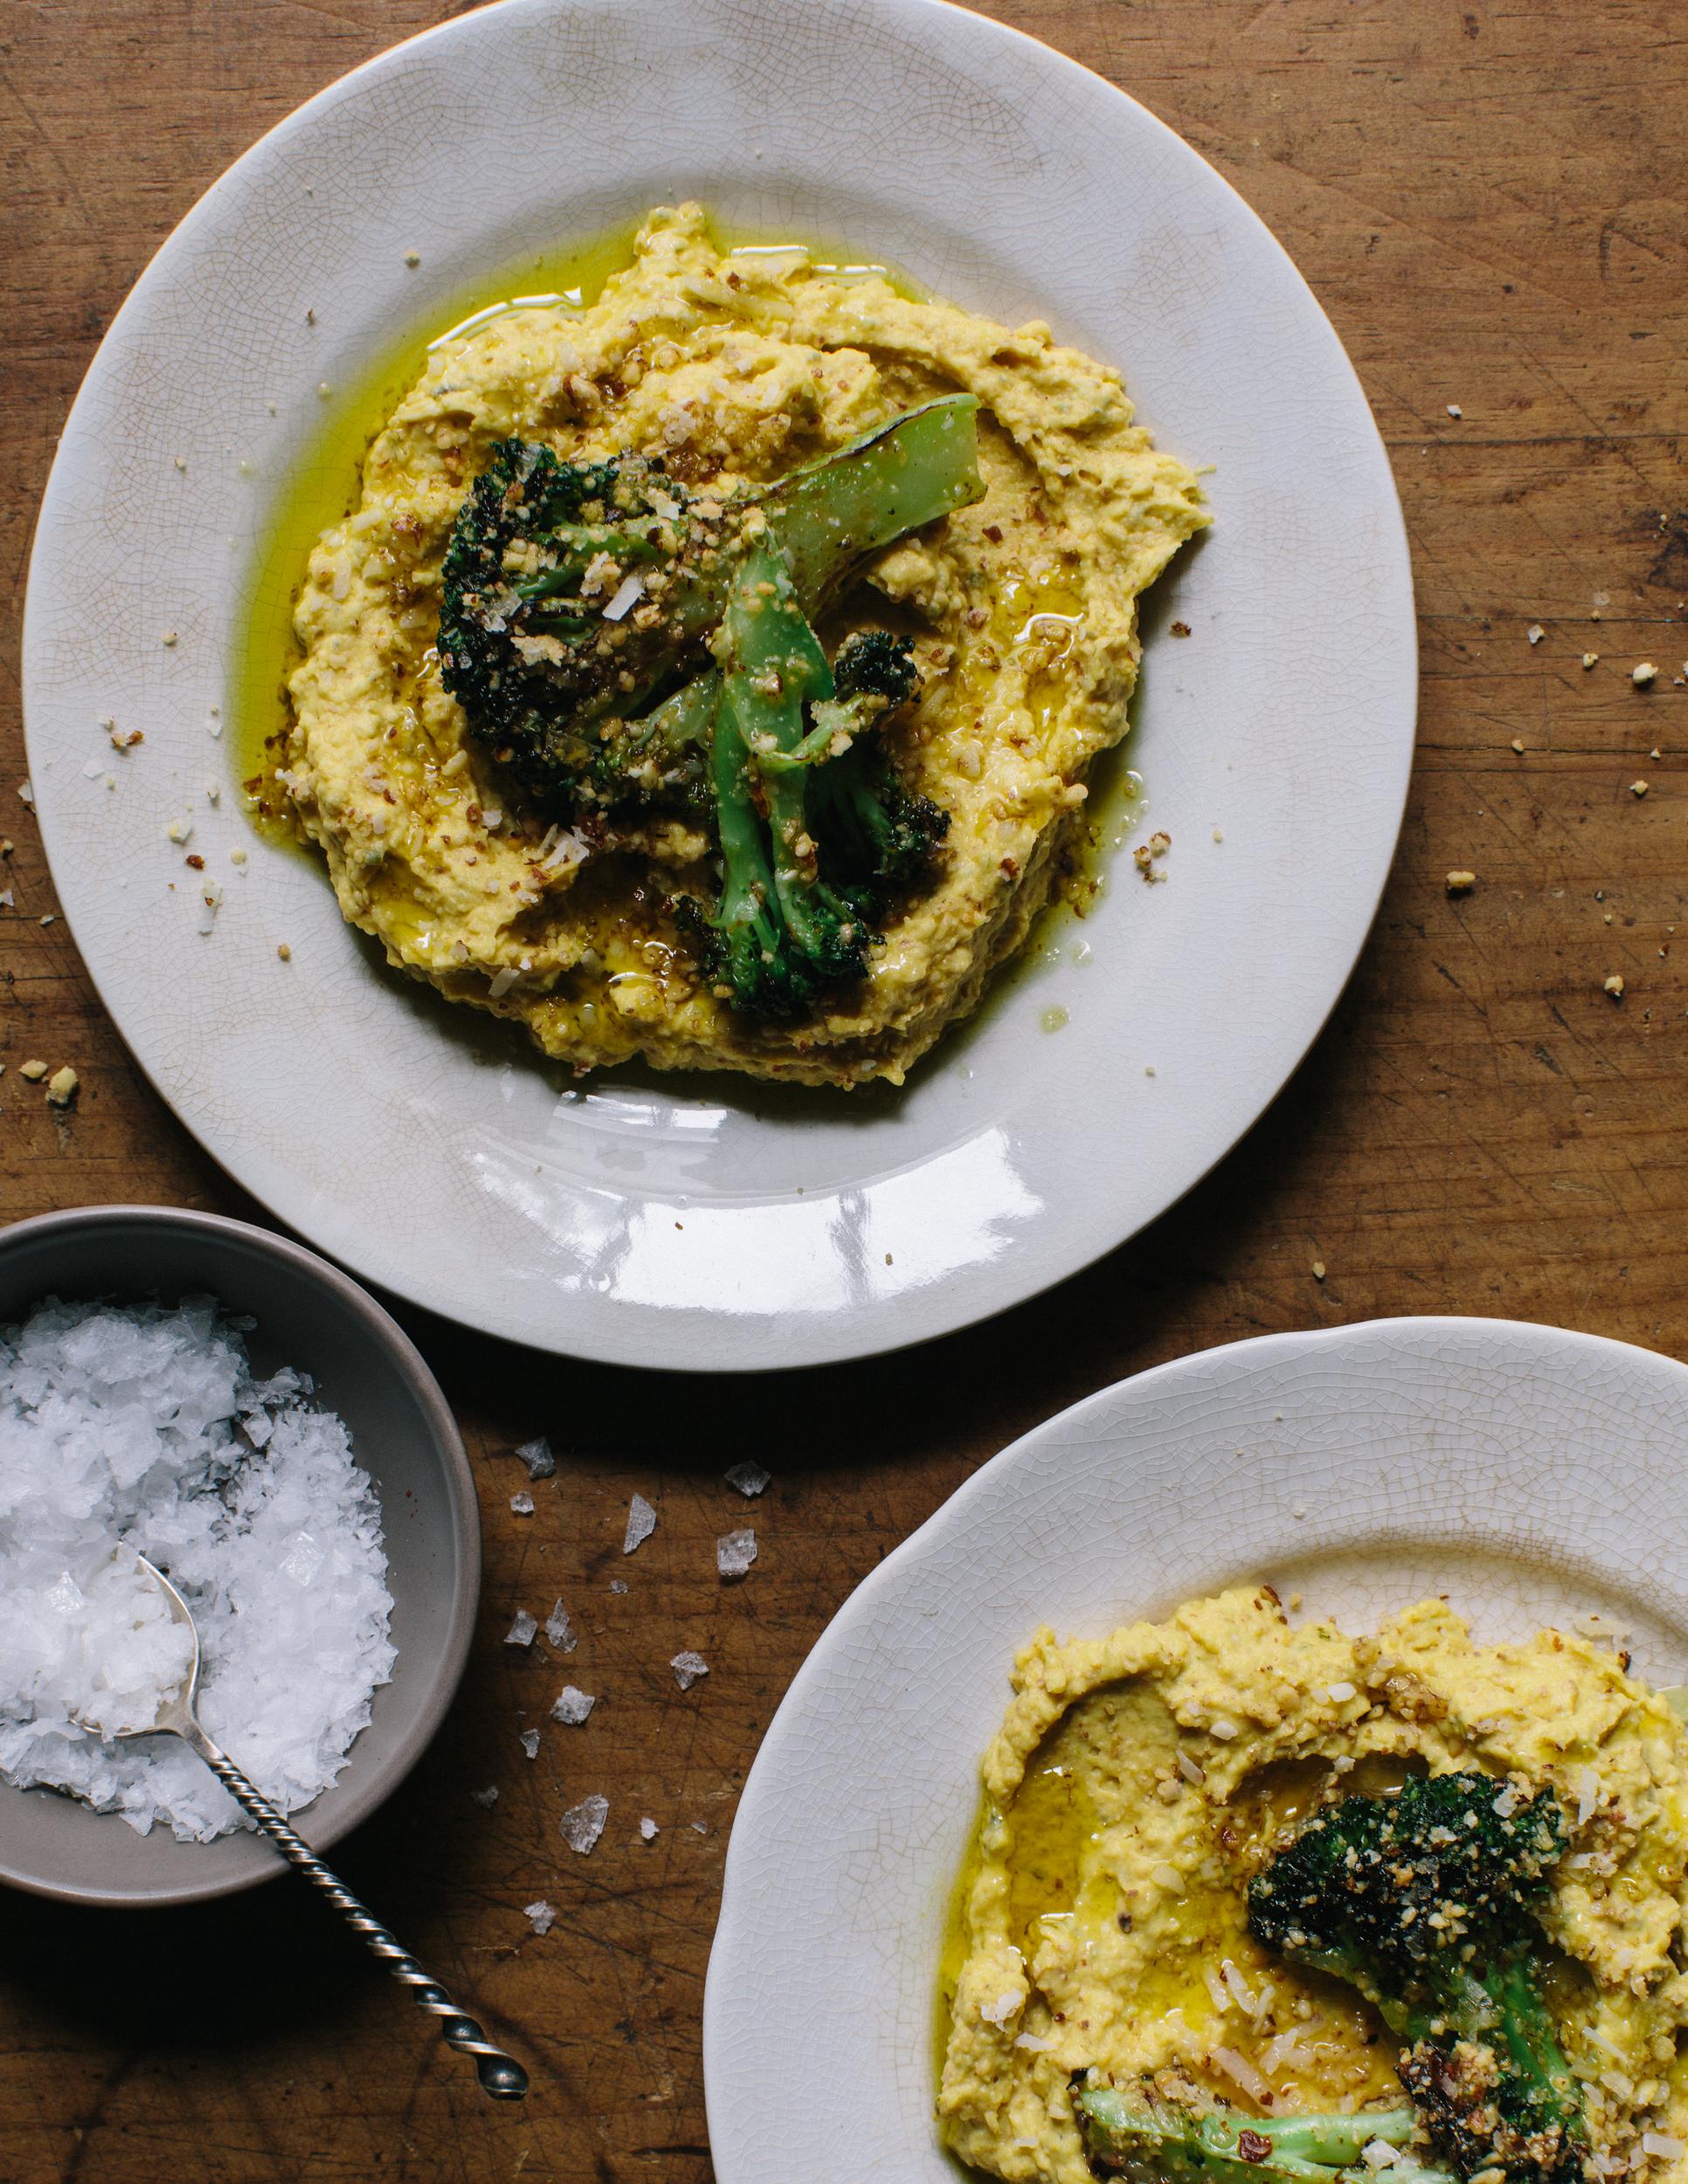 charred broccoli w hummus.jpg